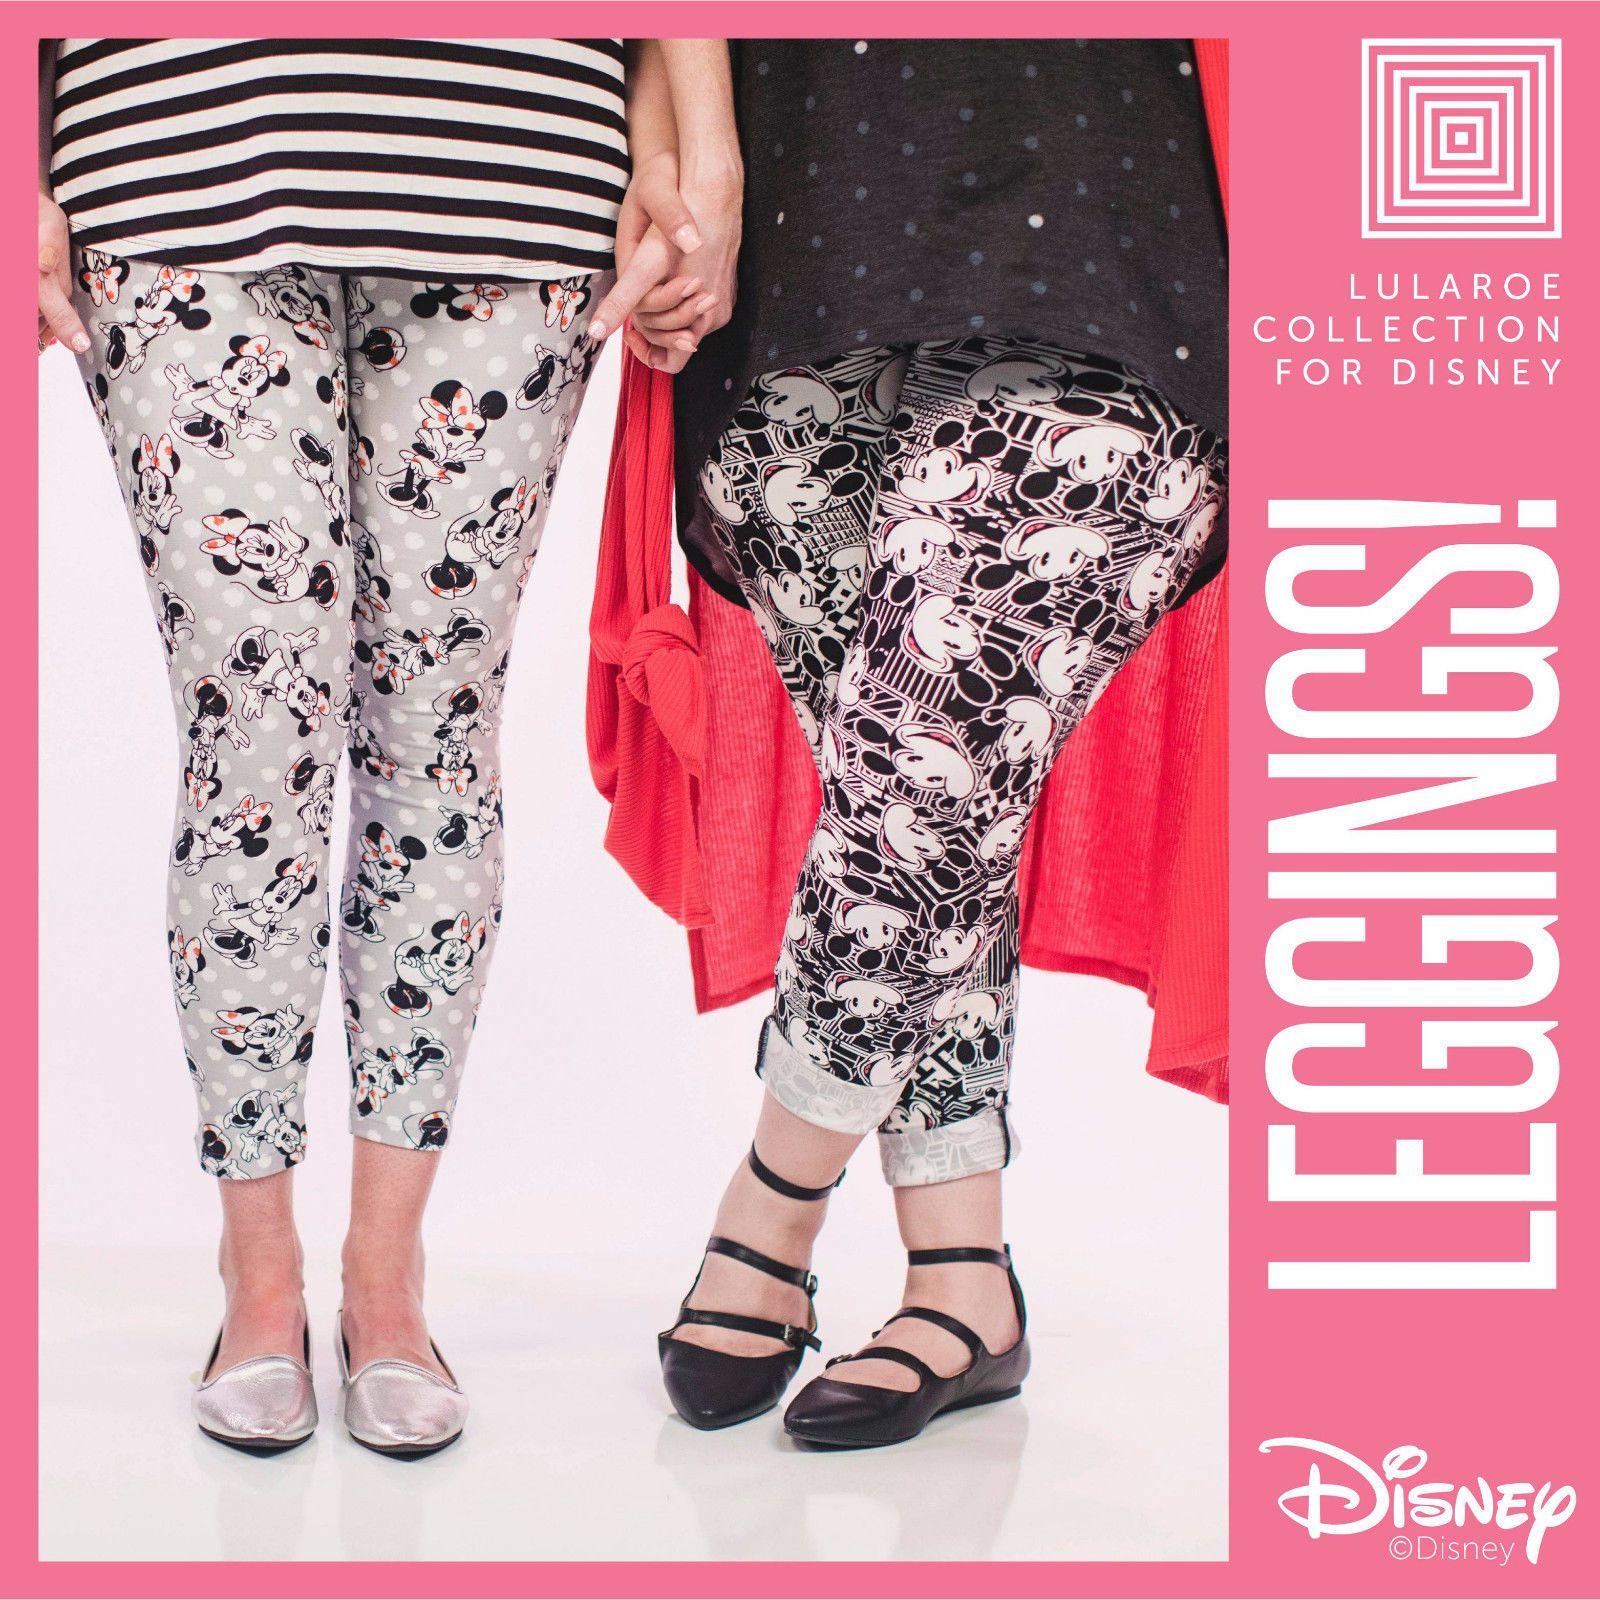 b211b5717226a Disney Collection LuLaRoe Leggings Tall & Curvy One Pair Mystery Pre Sale TC  NWT